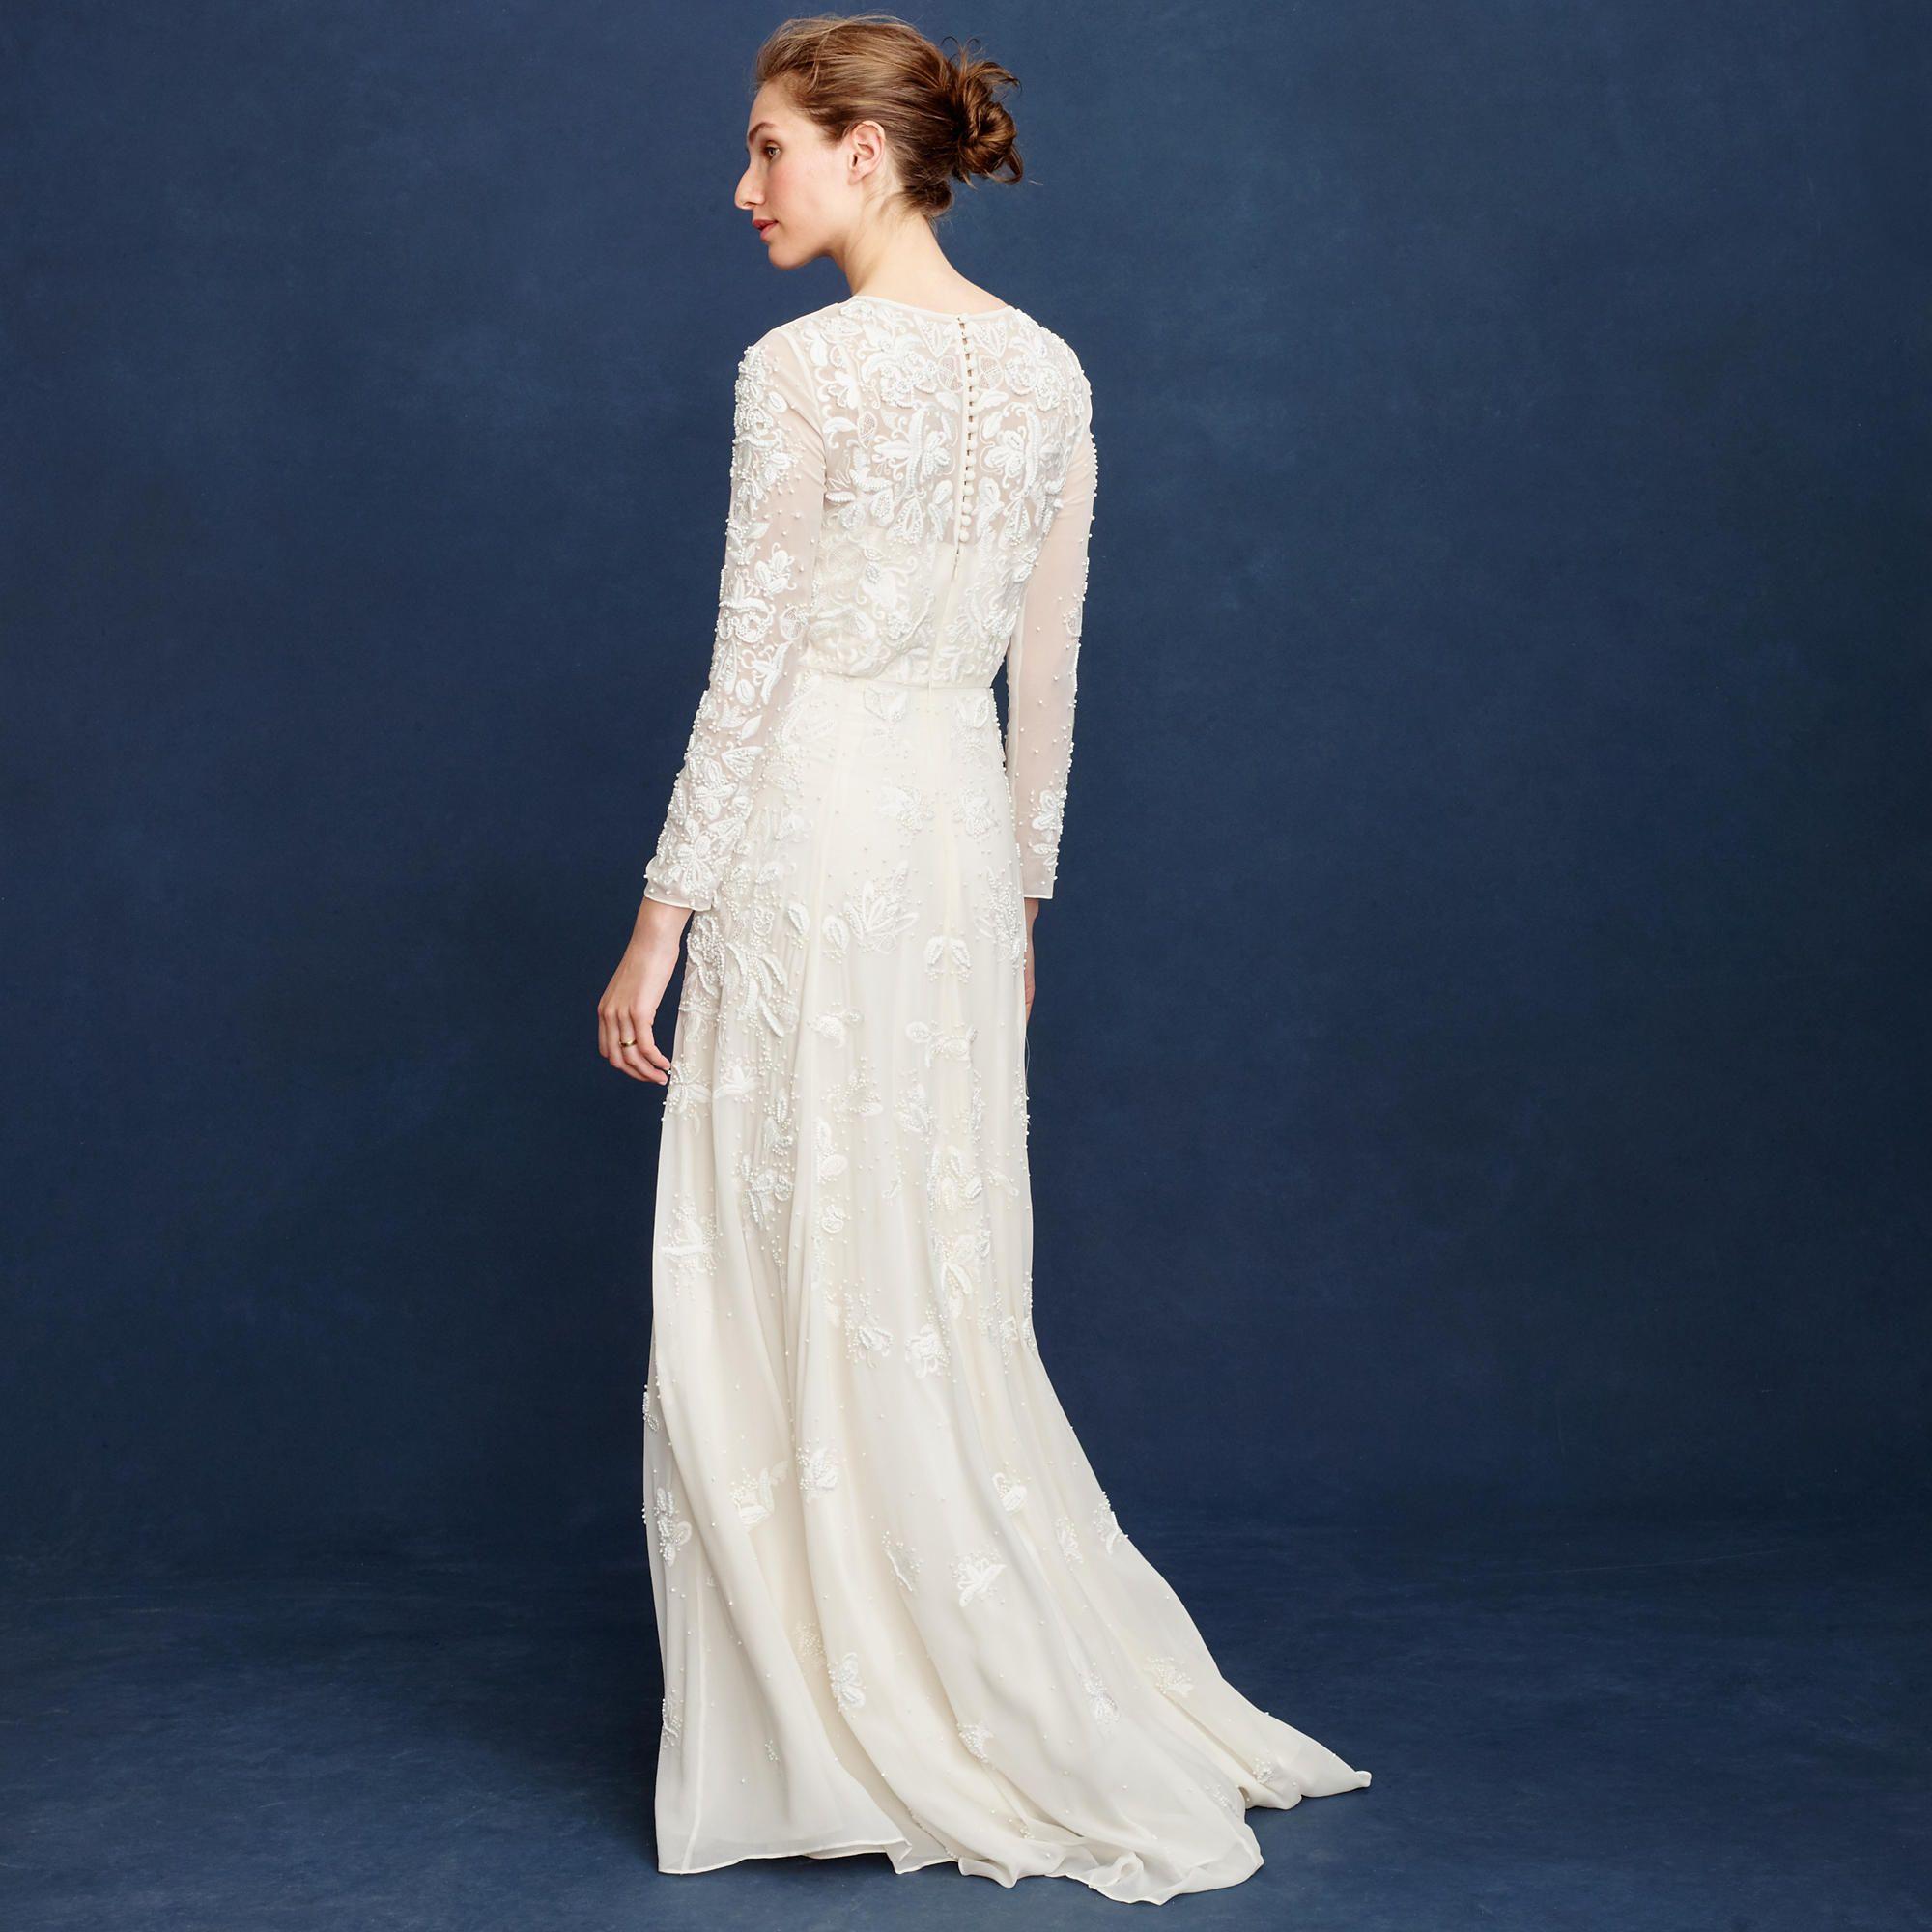 j. crew florence gown | dresses, wedding dresses, wedding